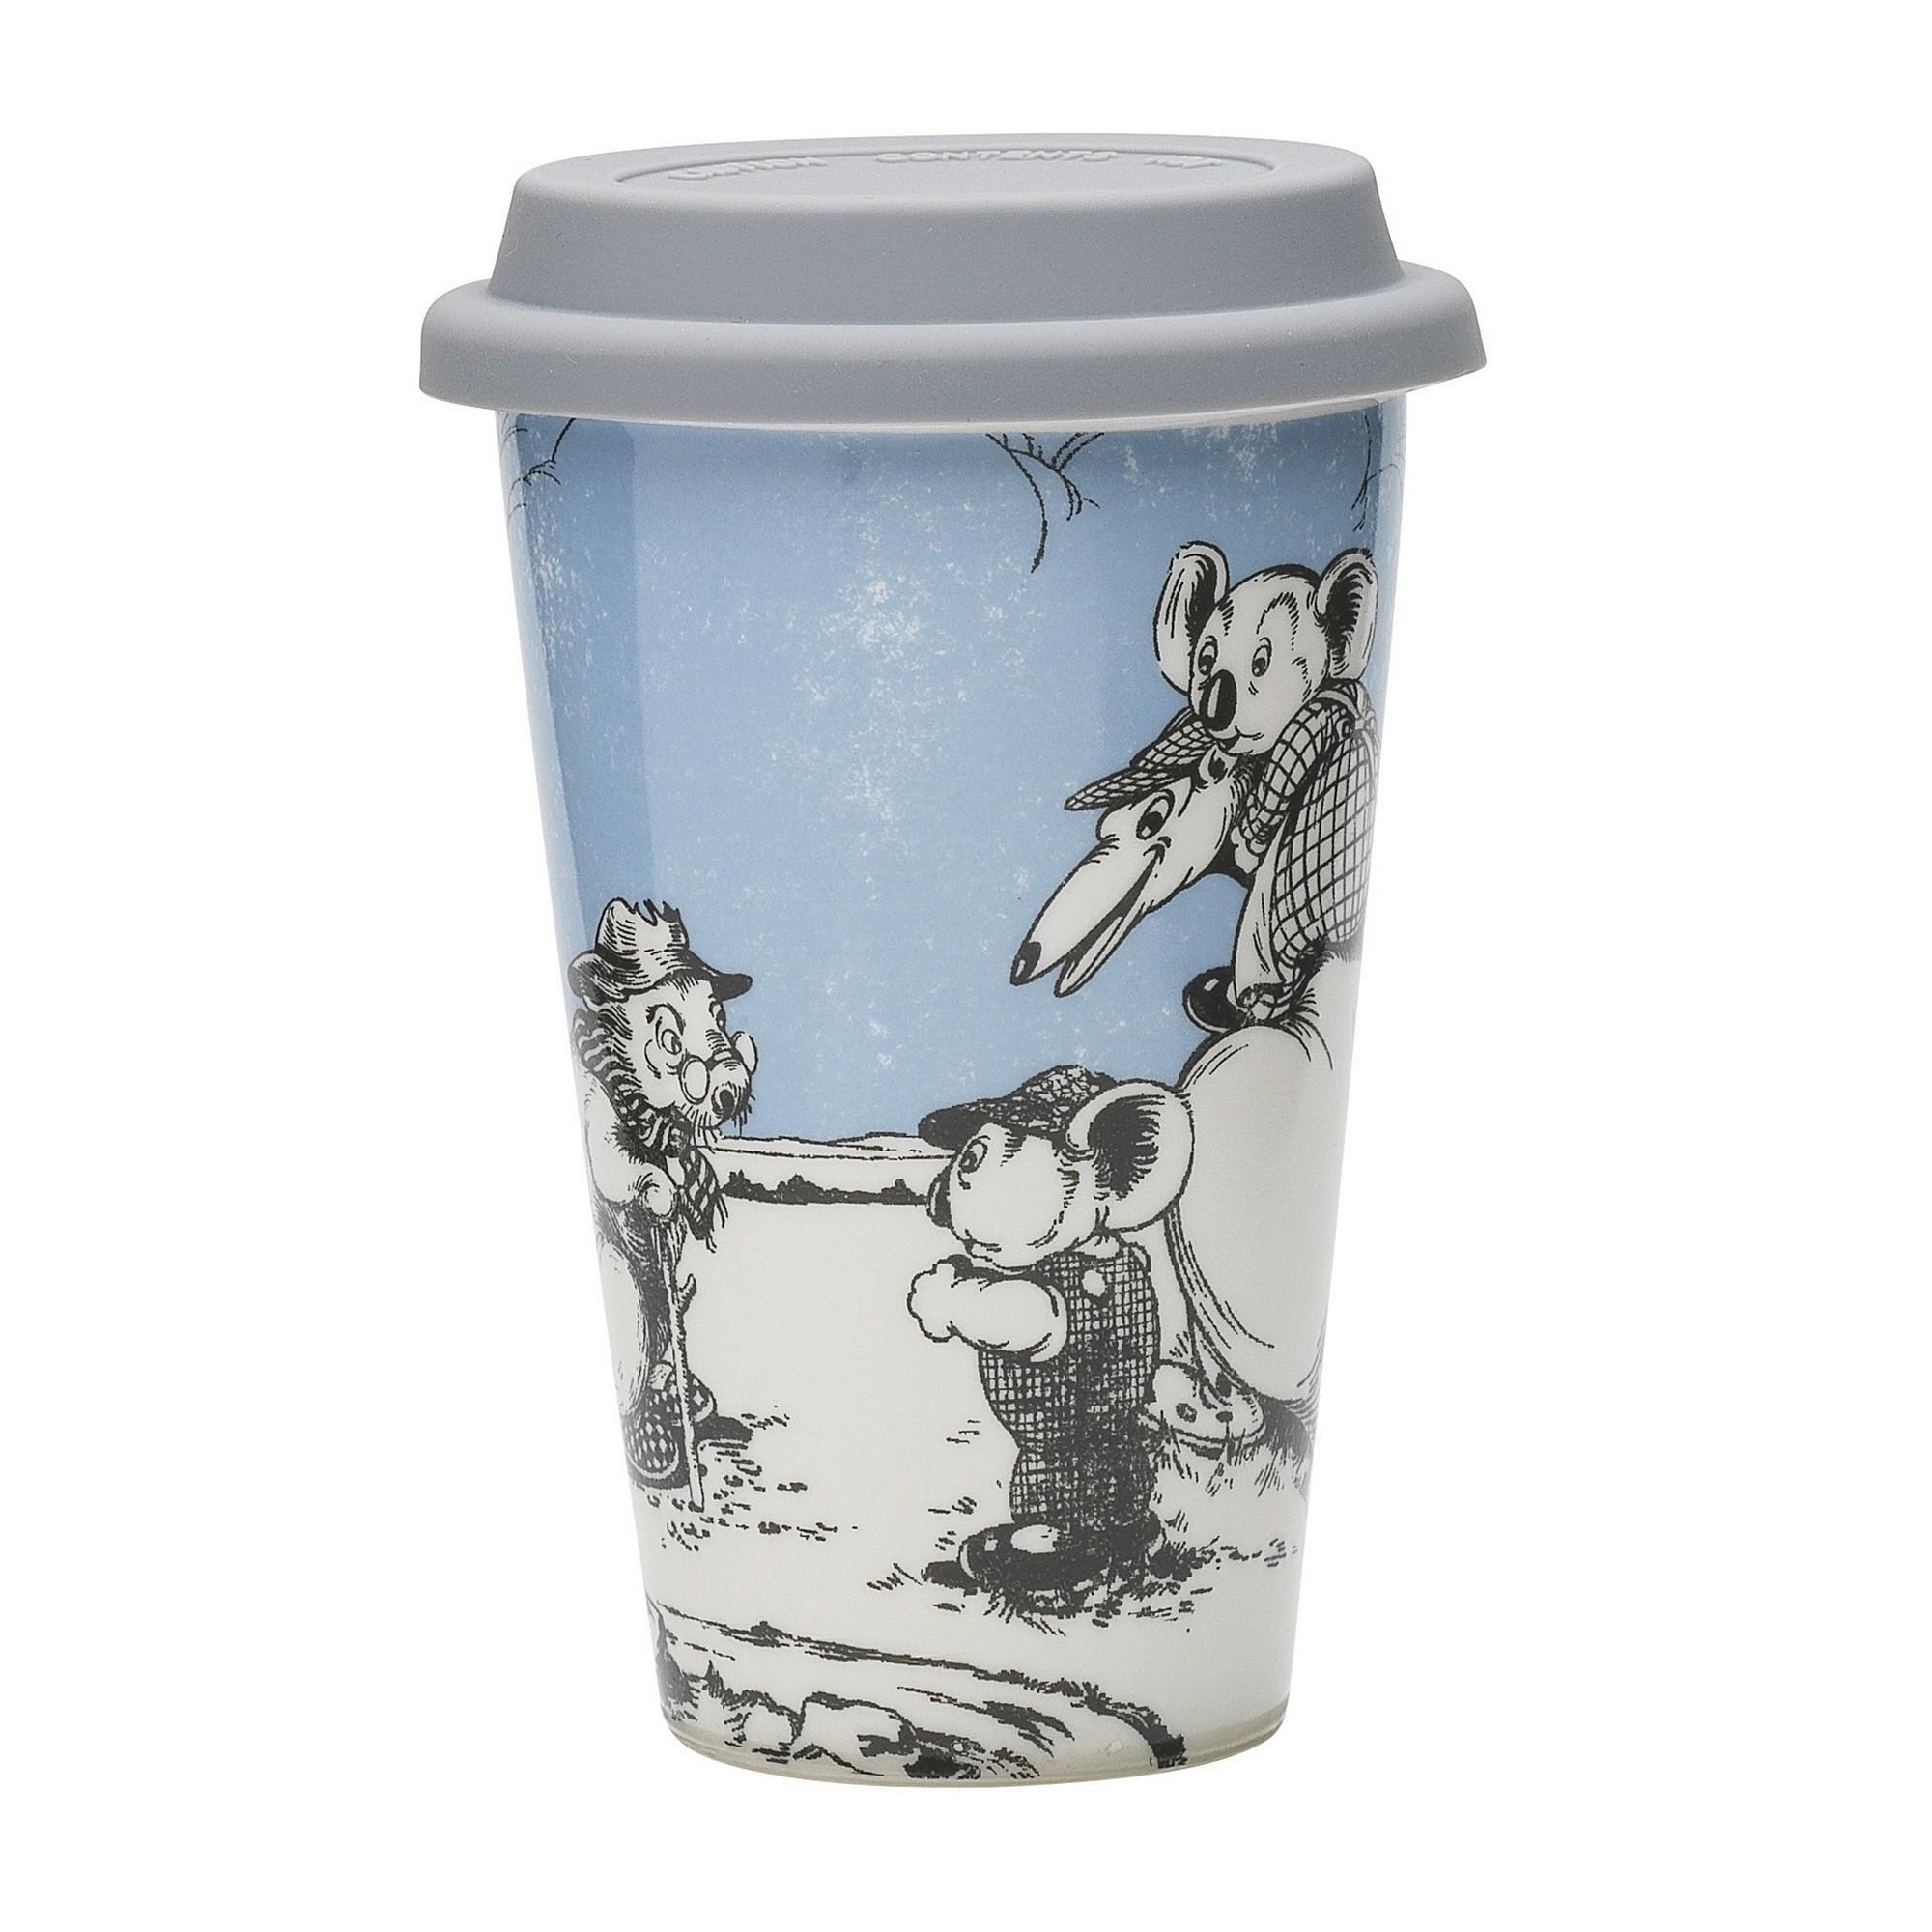 Ecology Blinky Bill New Bone China Travel Mug, Blue